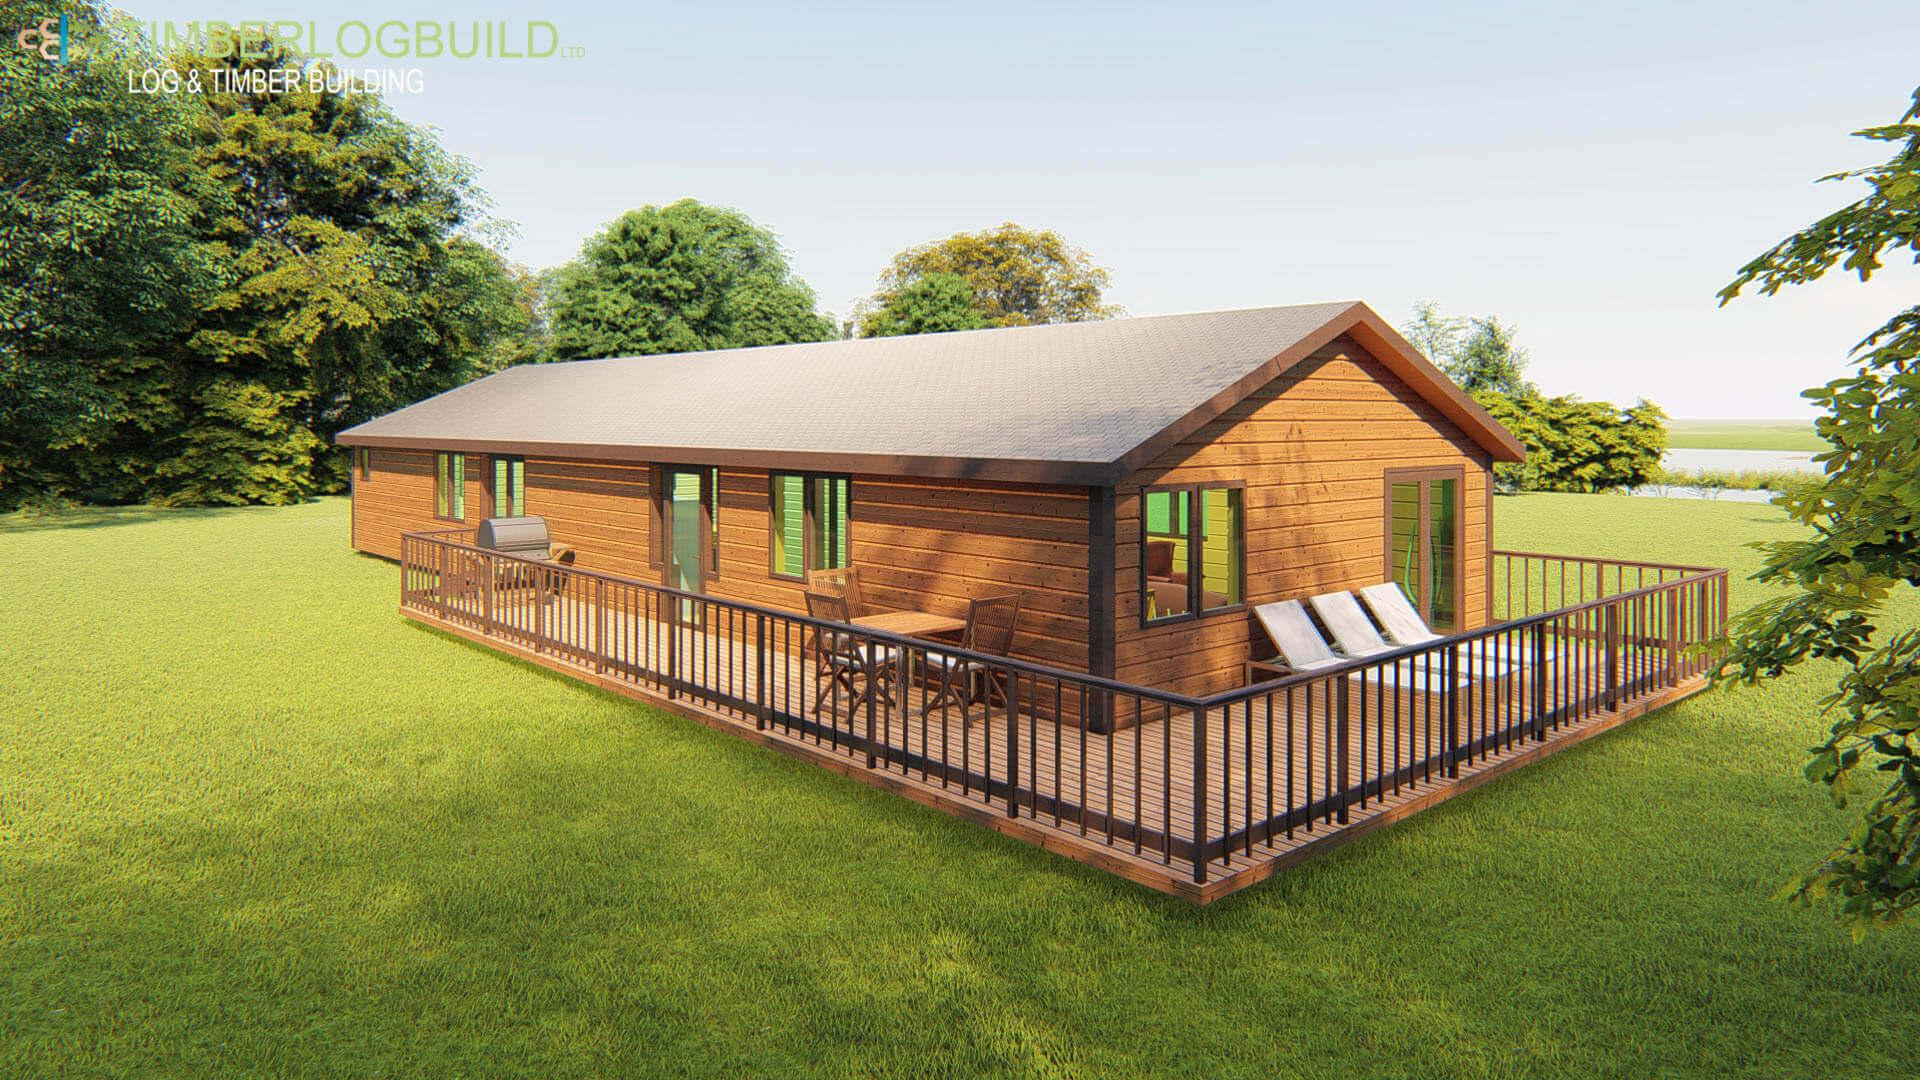 Timberlogbuild 136 4 BED (7)